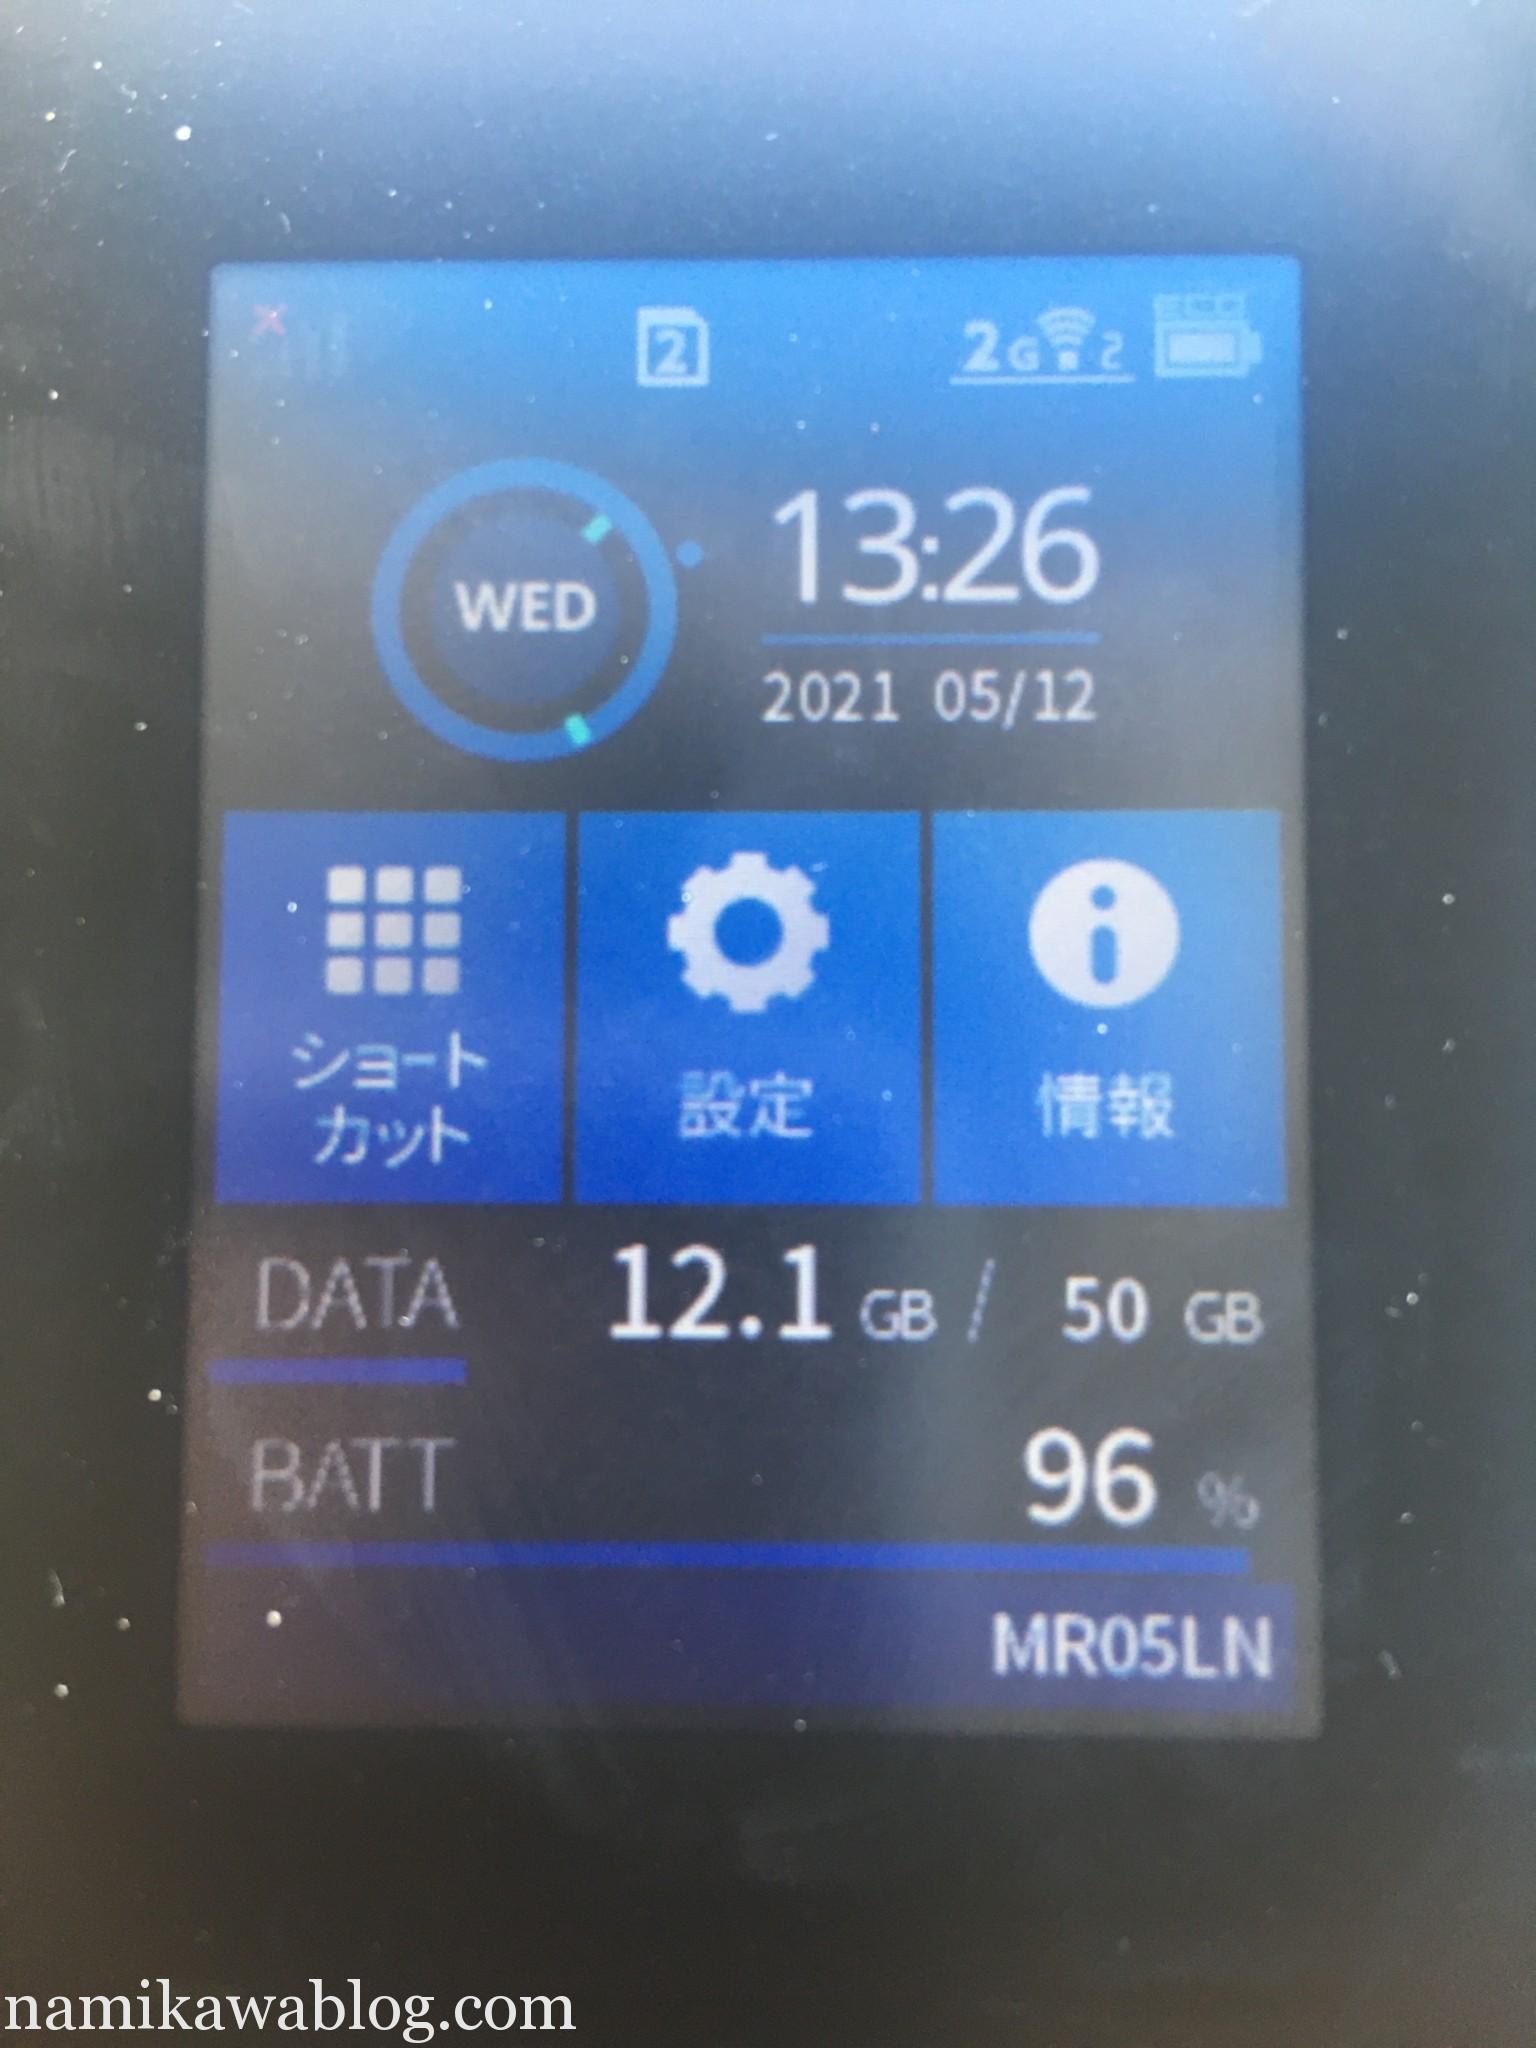 Nomad SIM解約後_Atrem MR05LNのデータ通信量